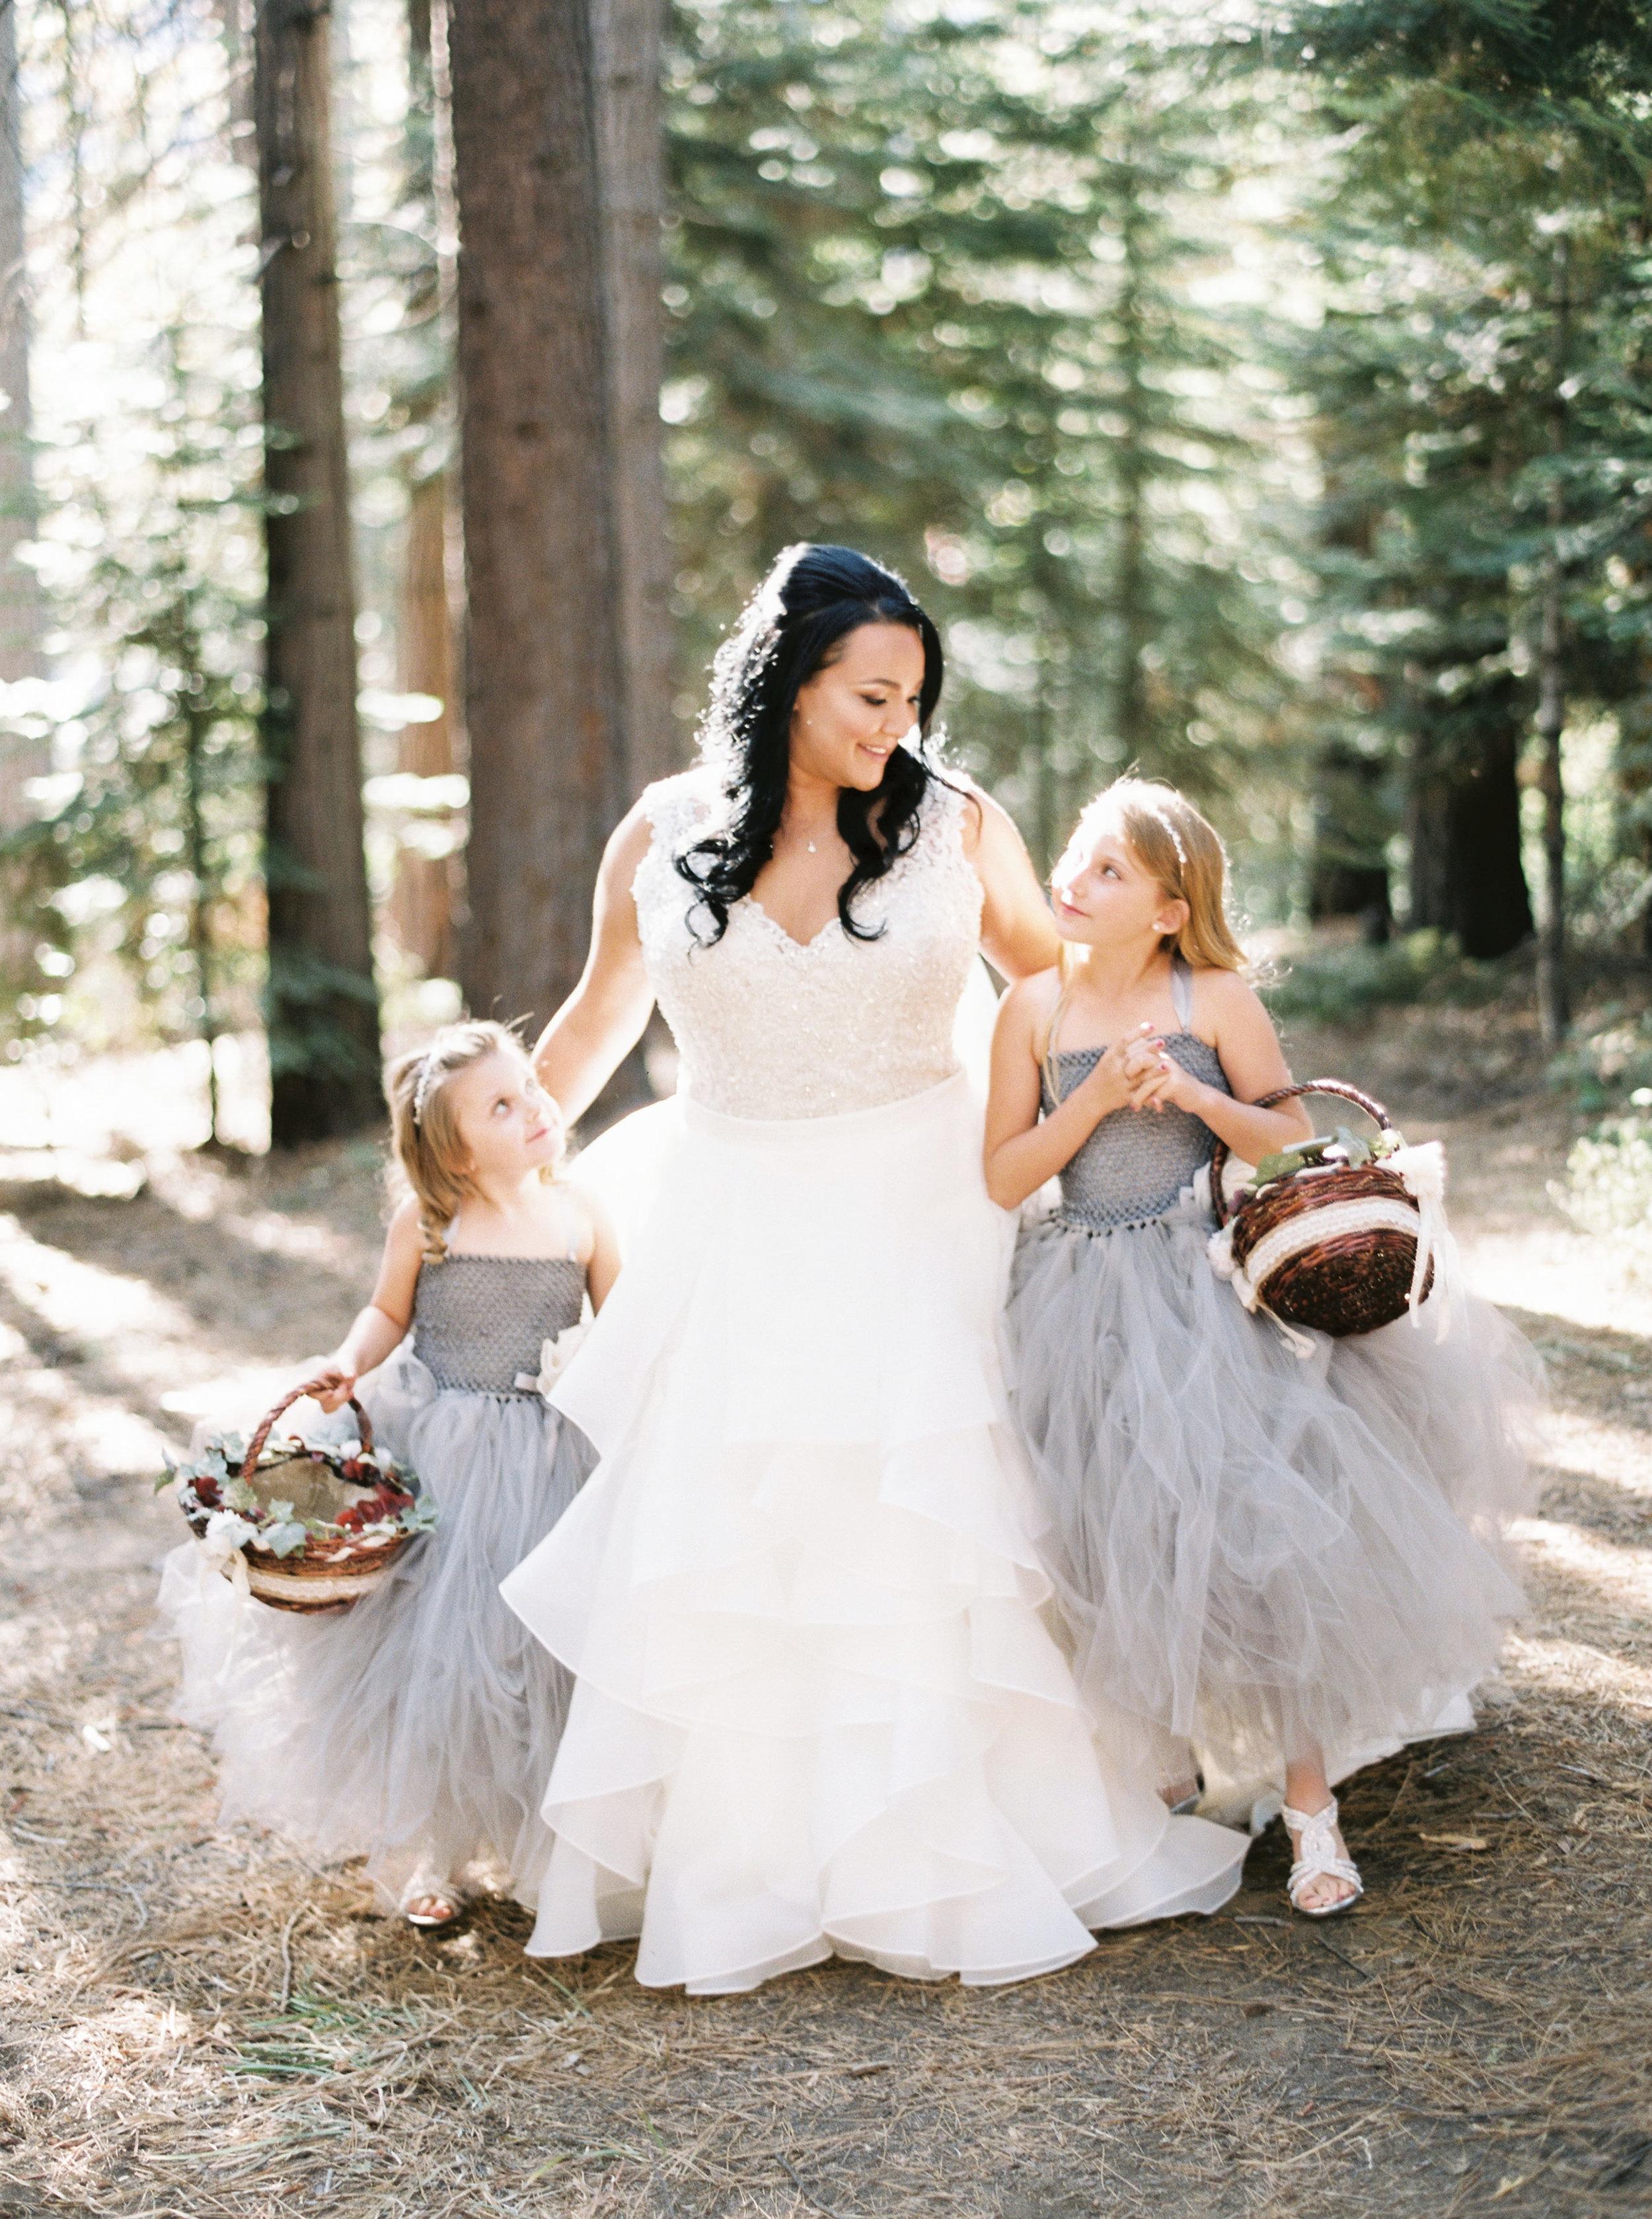 Tenaya-lodge-wedding-at-yosemite-national-park-california-44.jpg